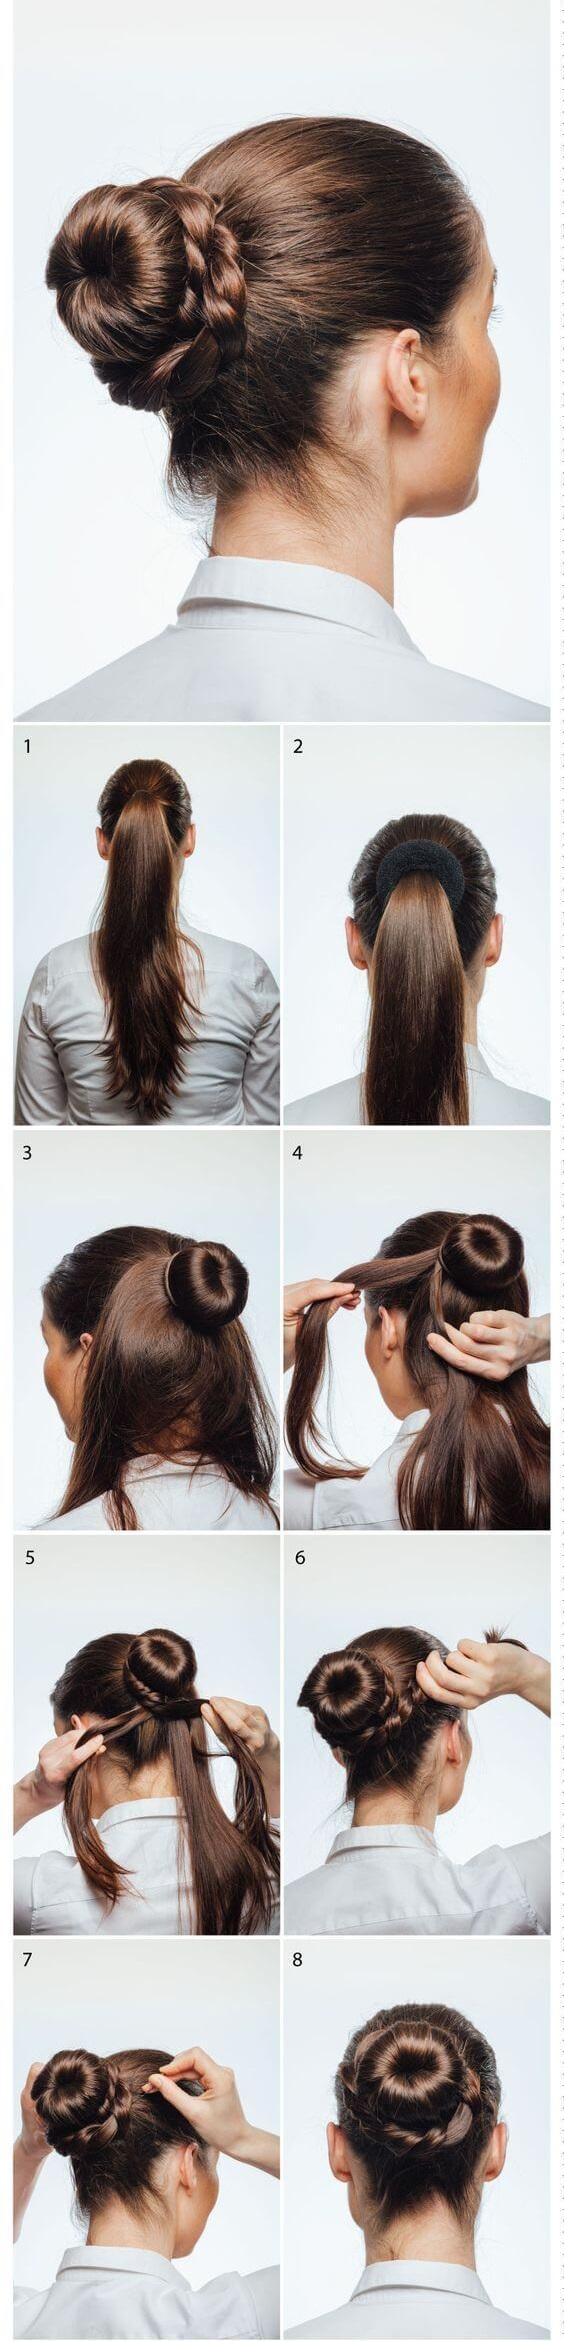 donut saç modeli